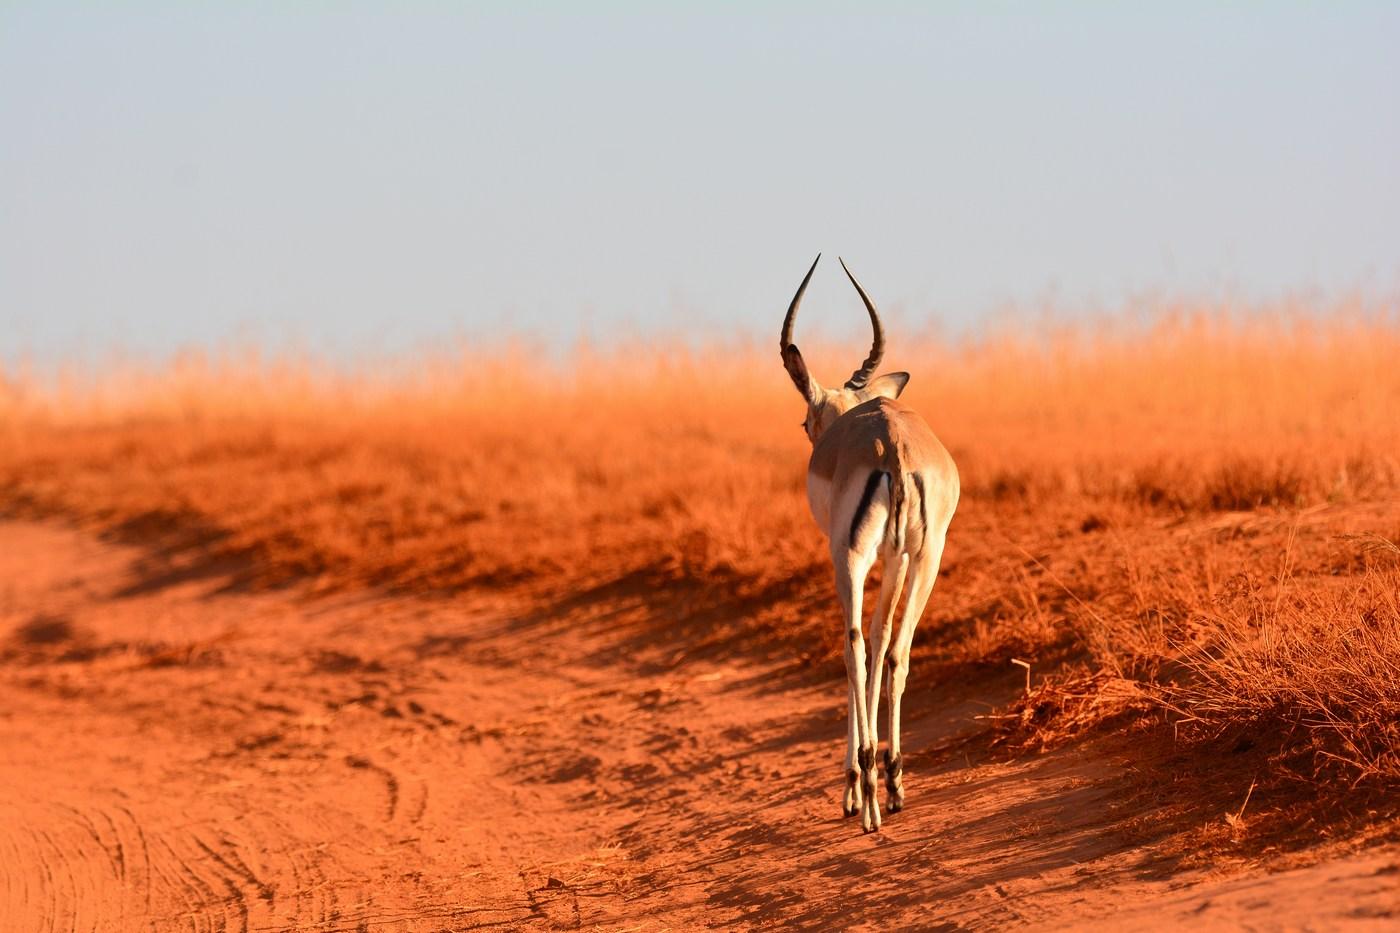 Un Impala (Aepyceros melampus) s'éloigne dans le soir.